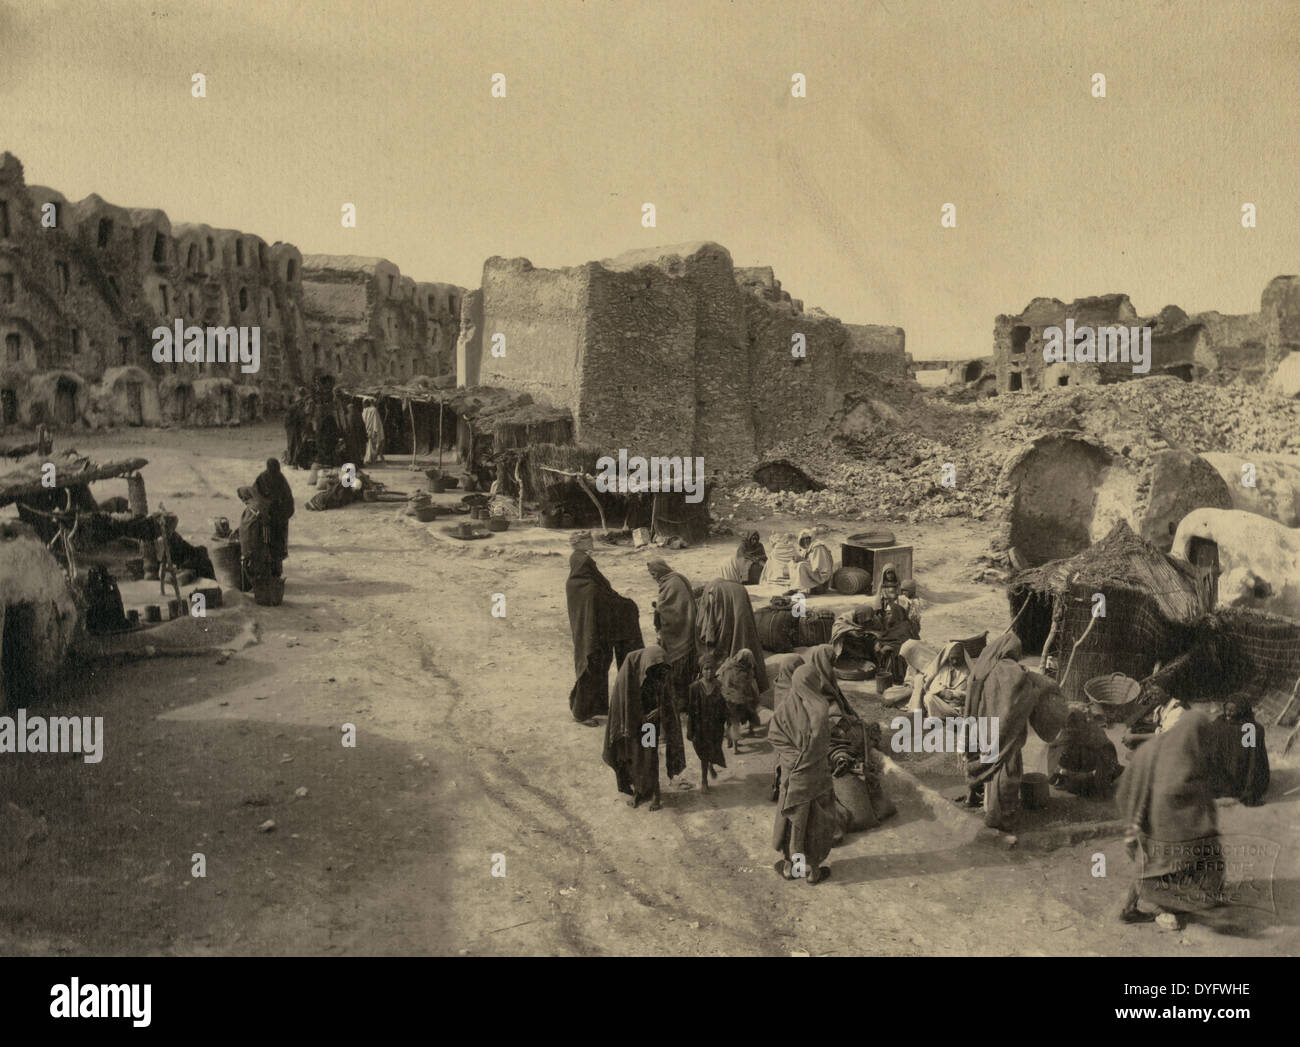 Le Marché de Médenine Street market, Madanīn, Tunisia 1900 - Stock Image